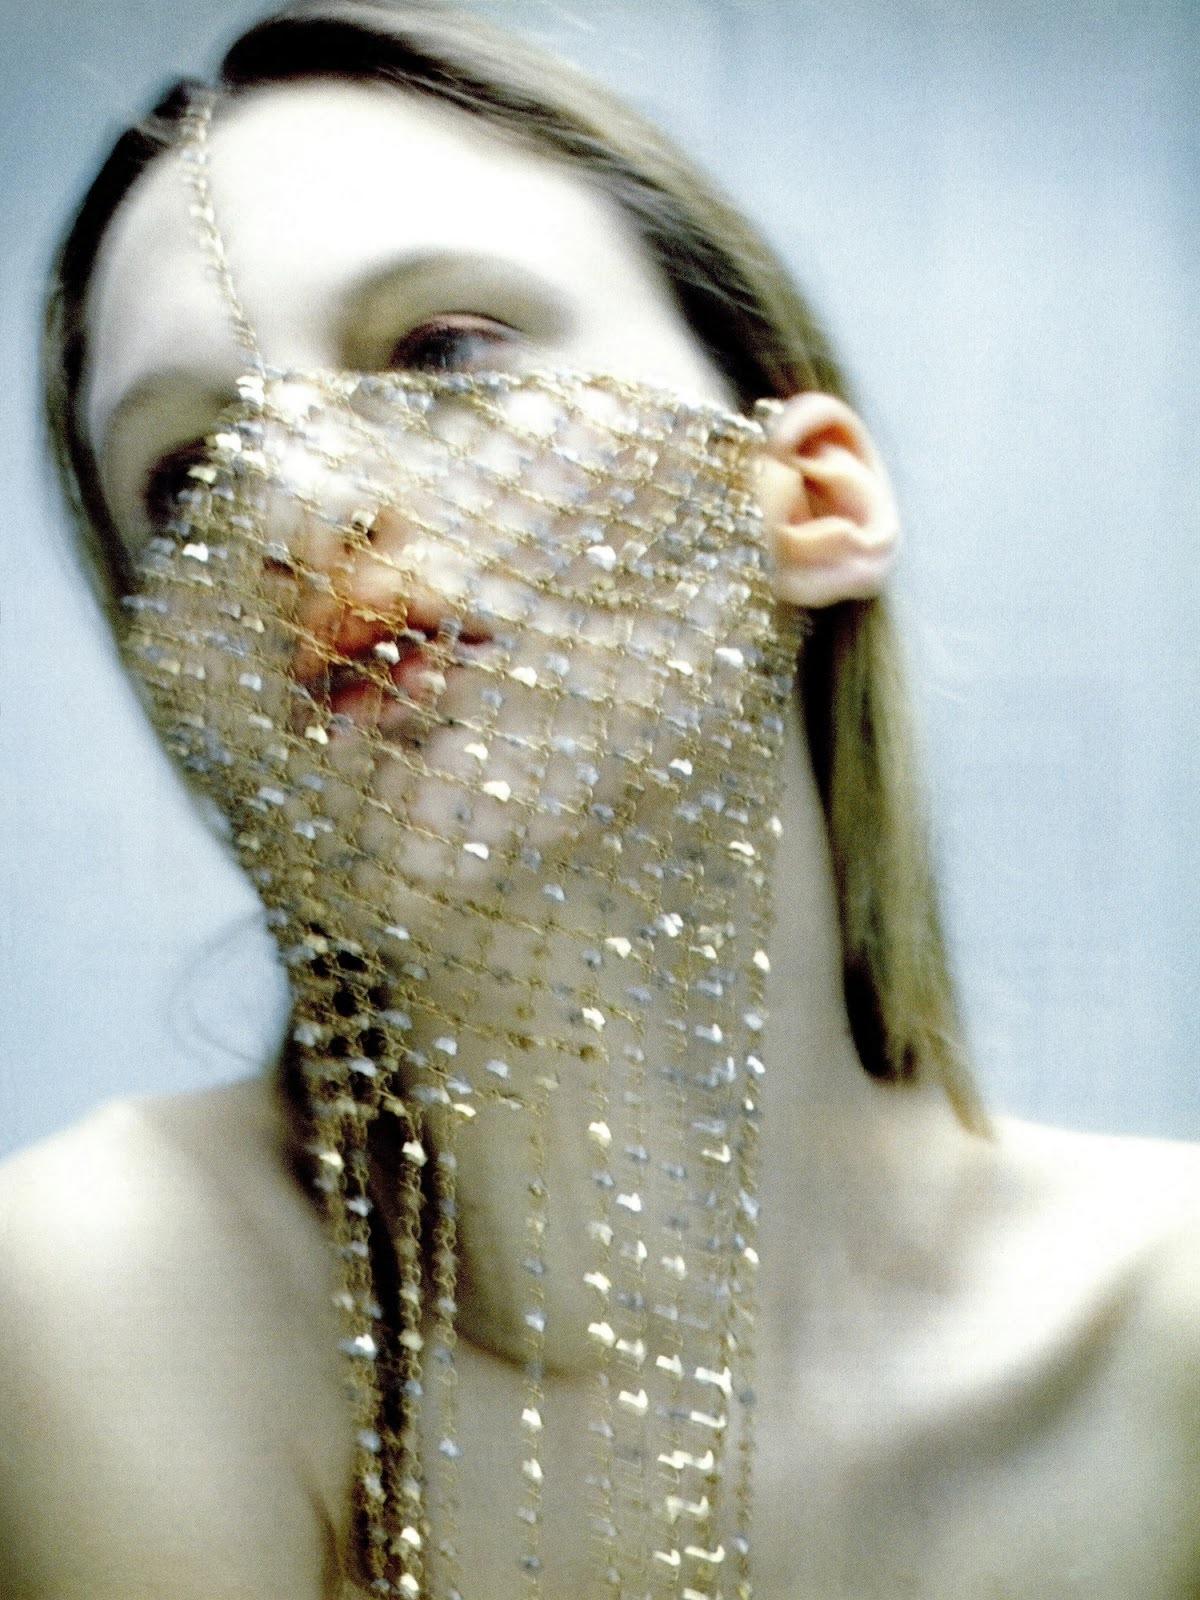 Martina_Hoogland_Ivanow-Dazed-Confused-1997-01-foudre.jpeg